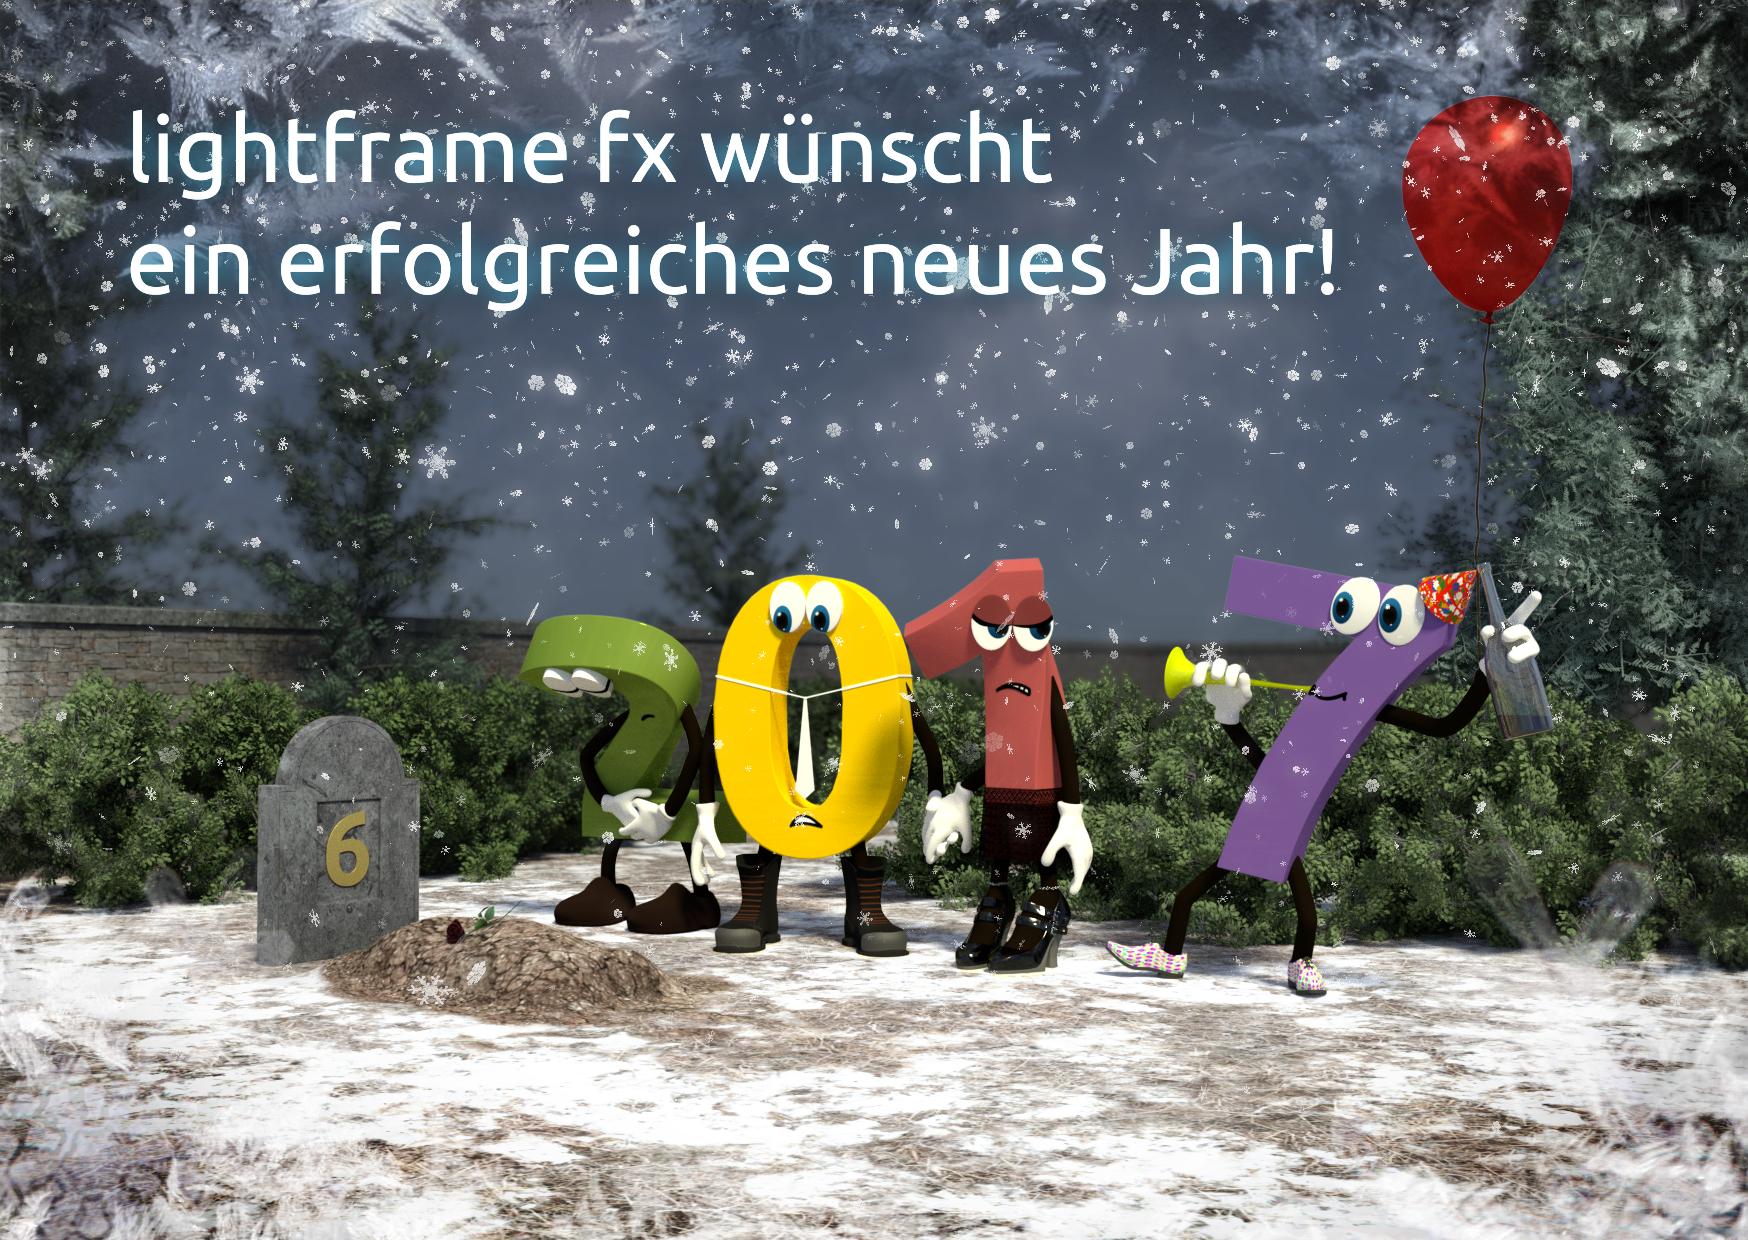 lightframe fx - lightframe fx Archive - lightframe fx